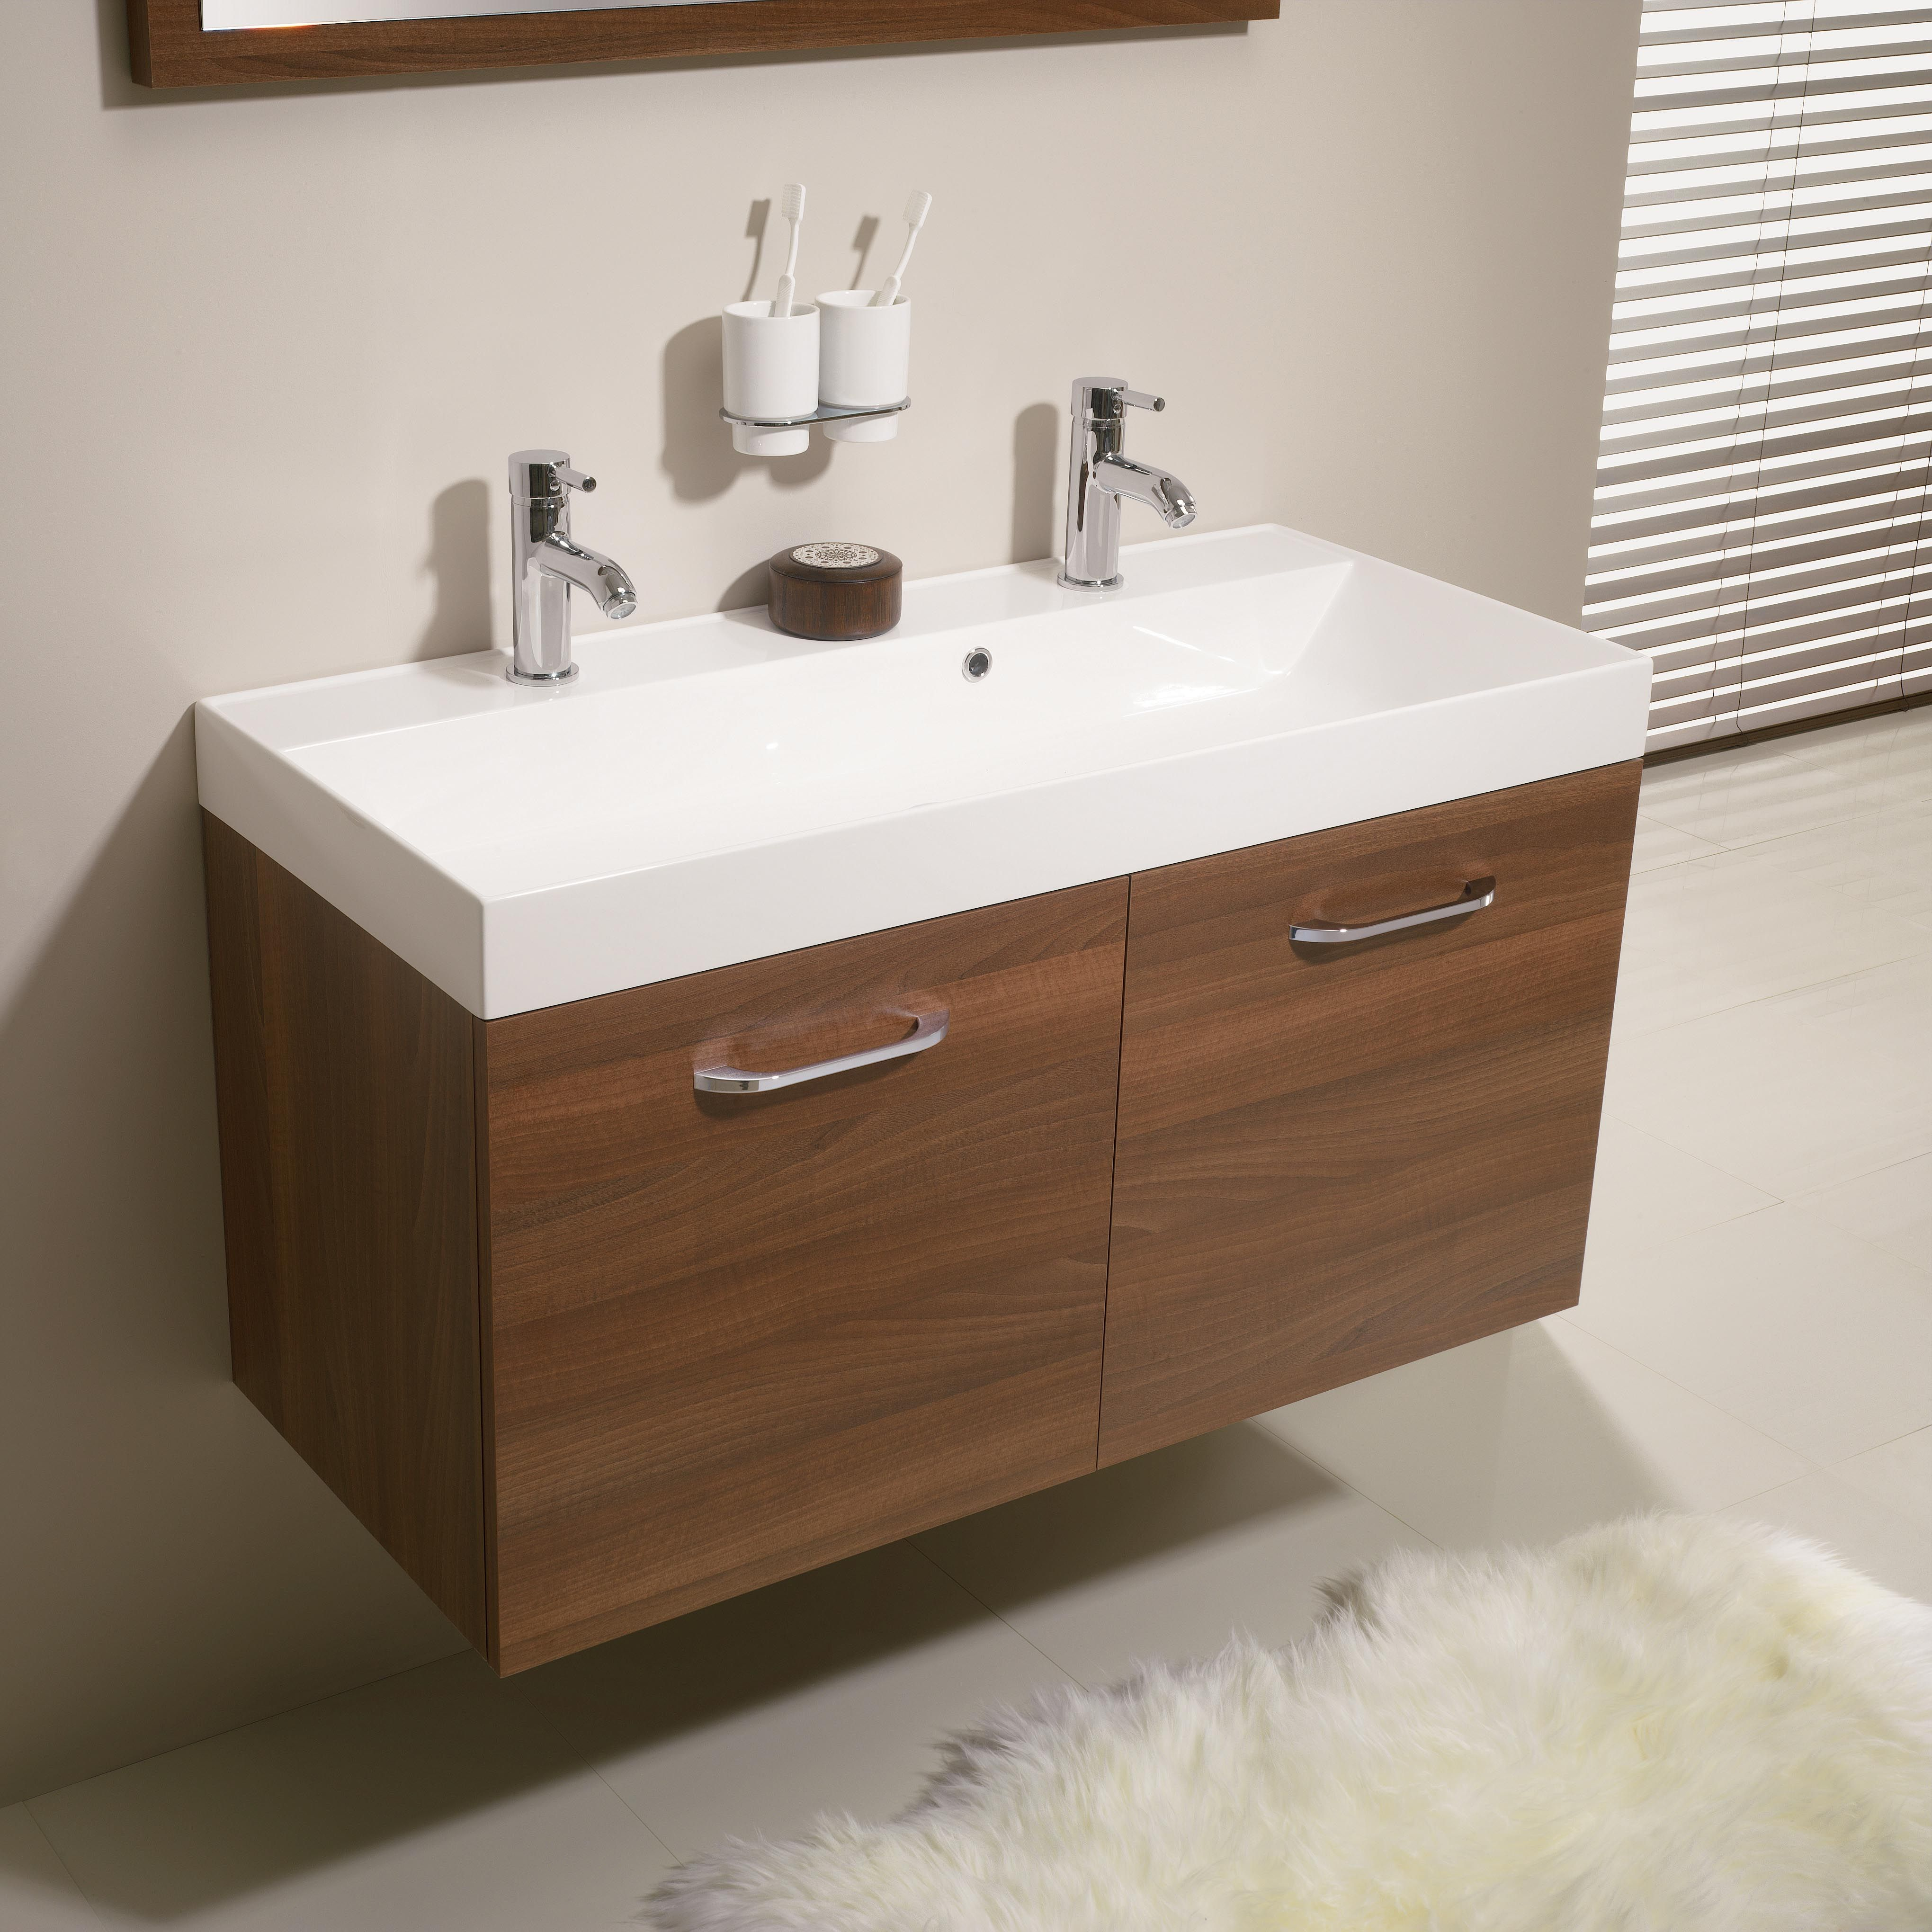 Elegant Bauhaus Bathroom Furniture  SquareMelon SquareMelon